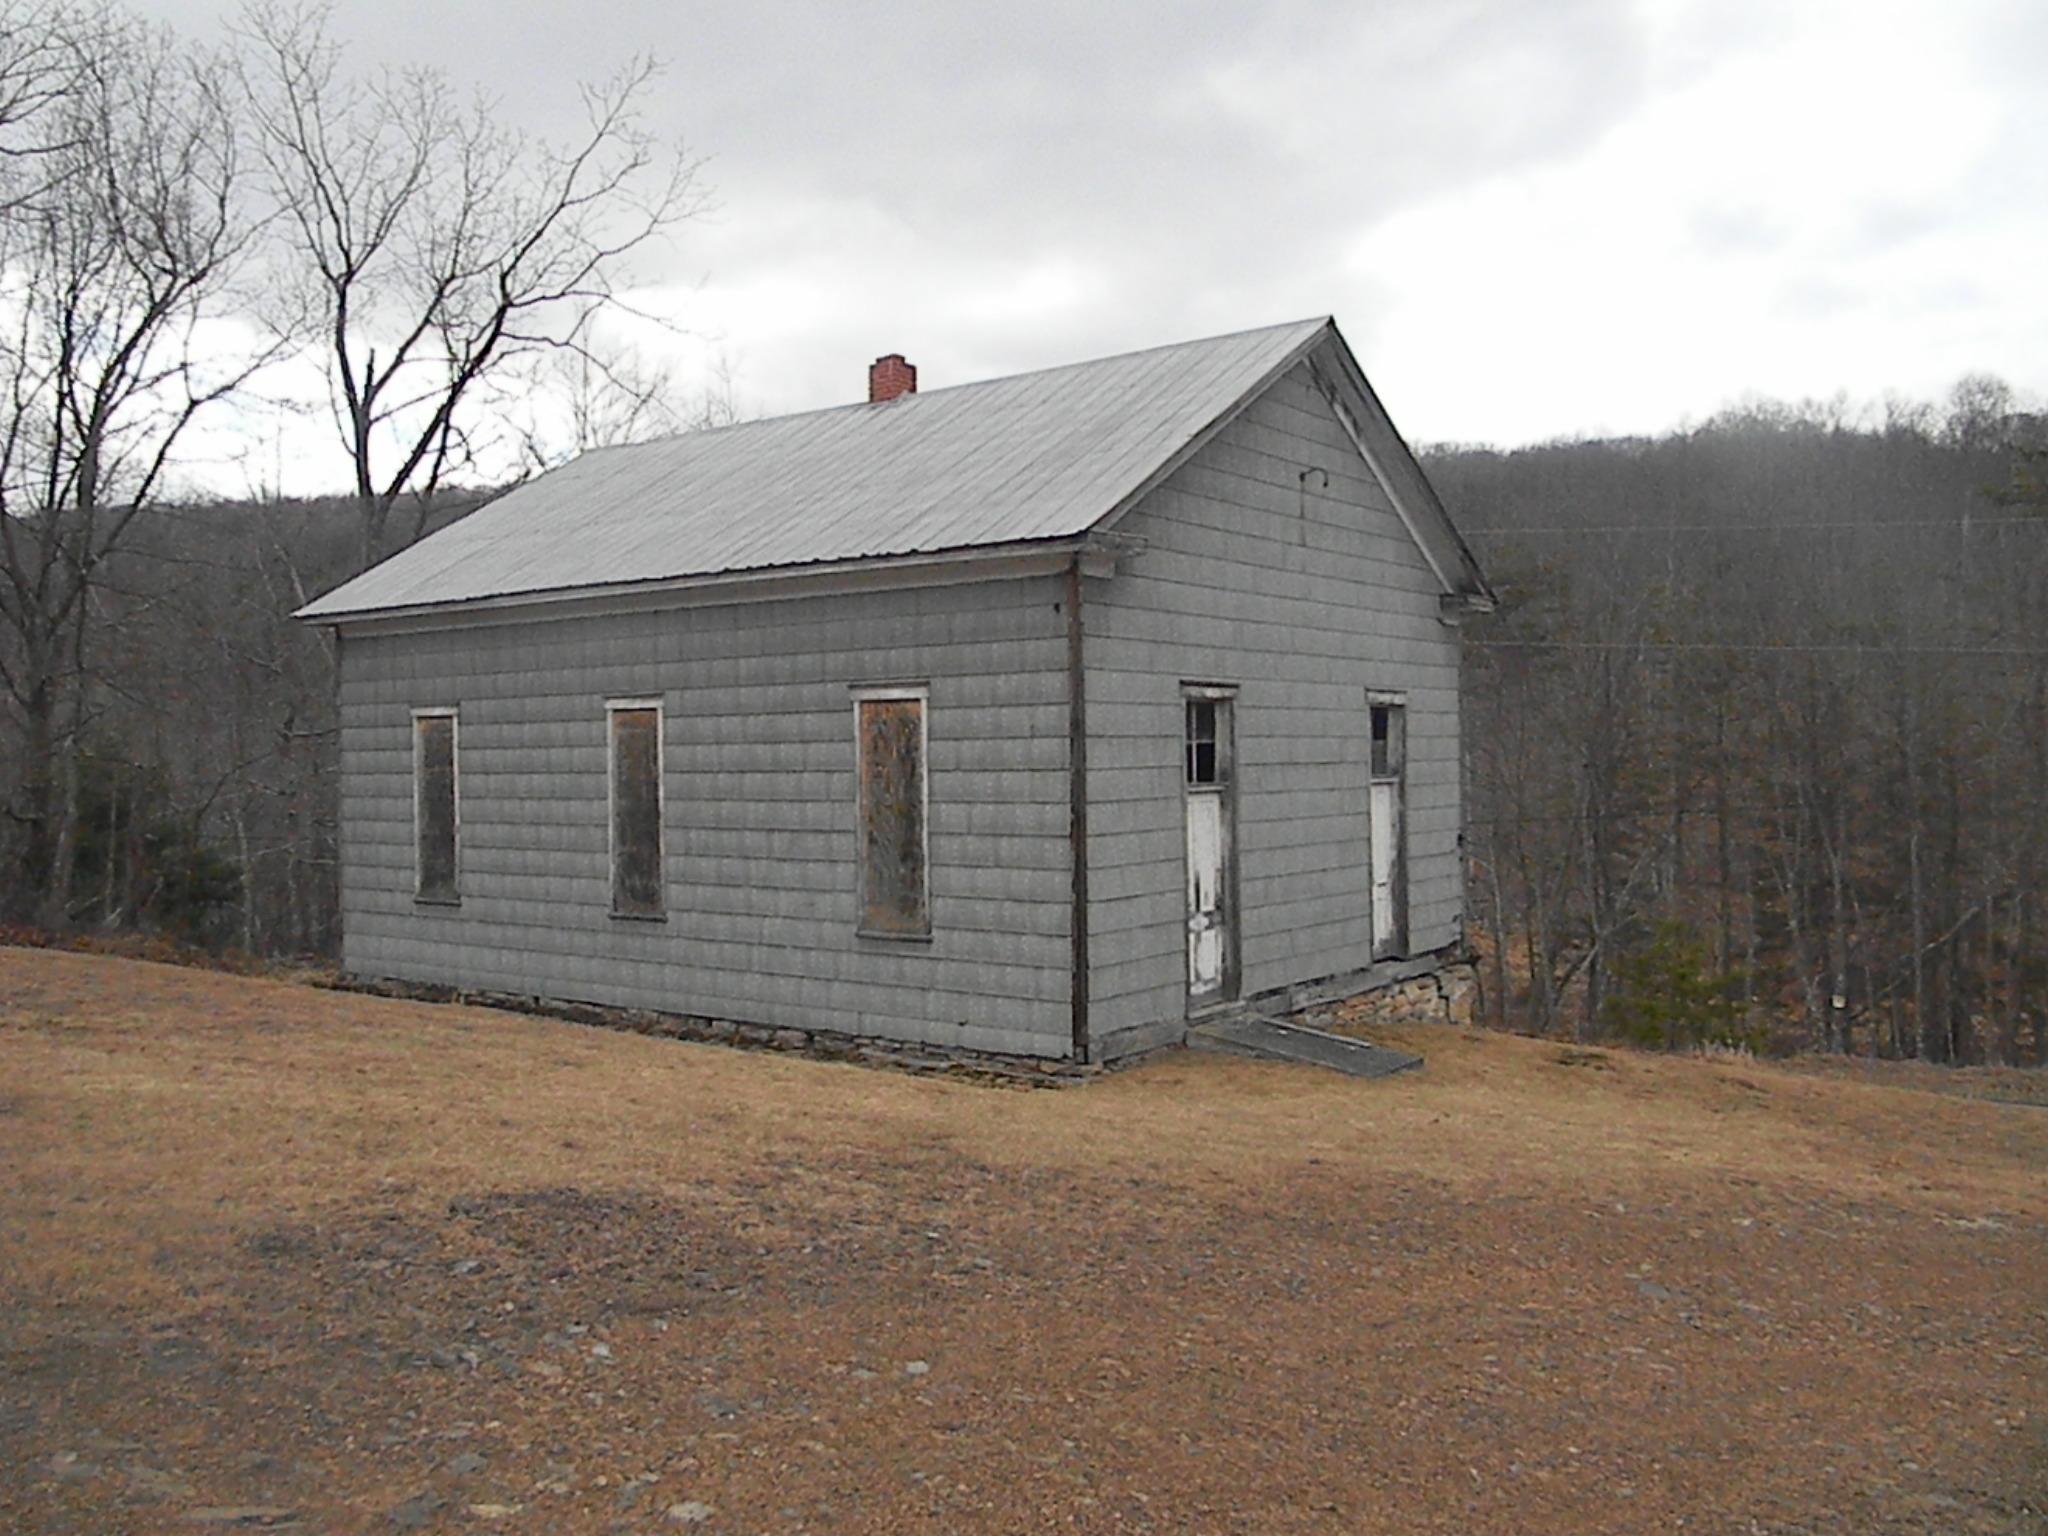 Mount Hope Christian Church